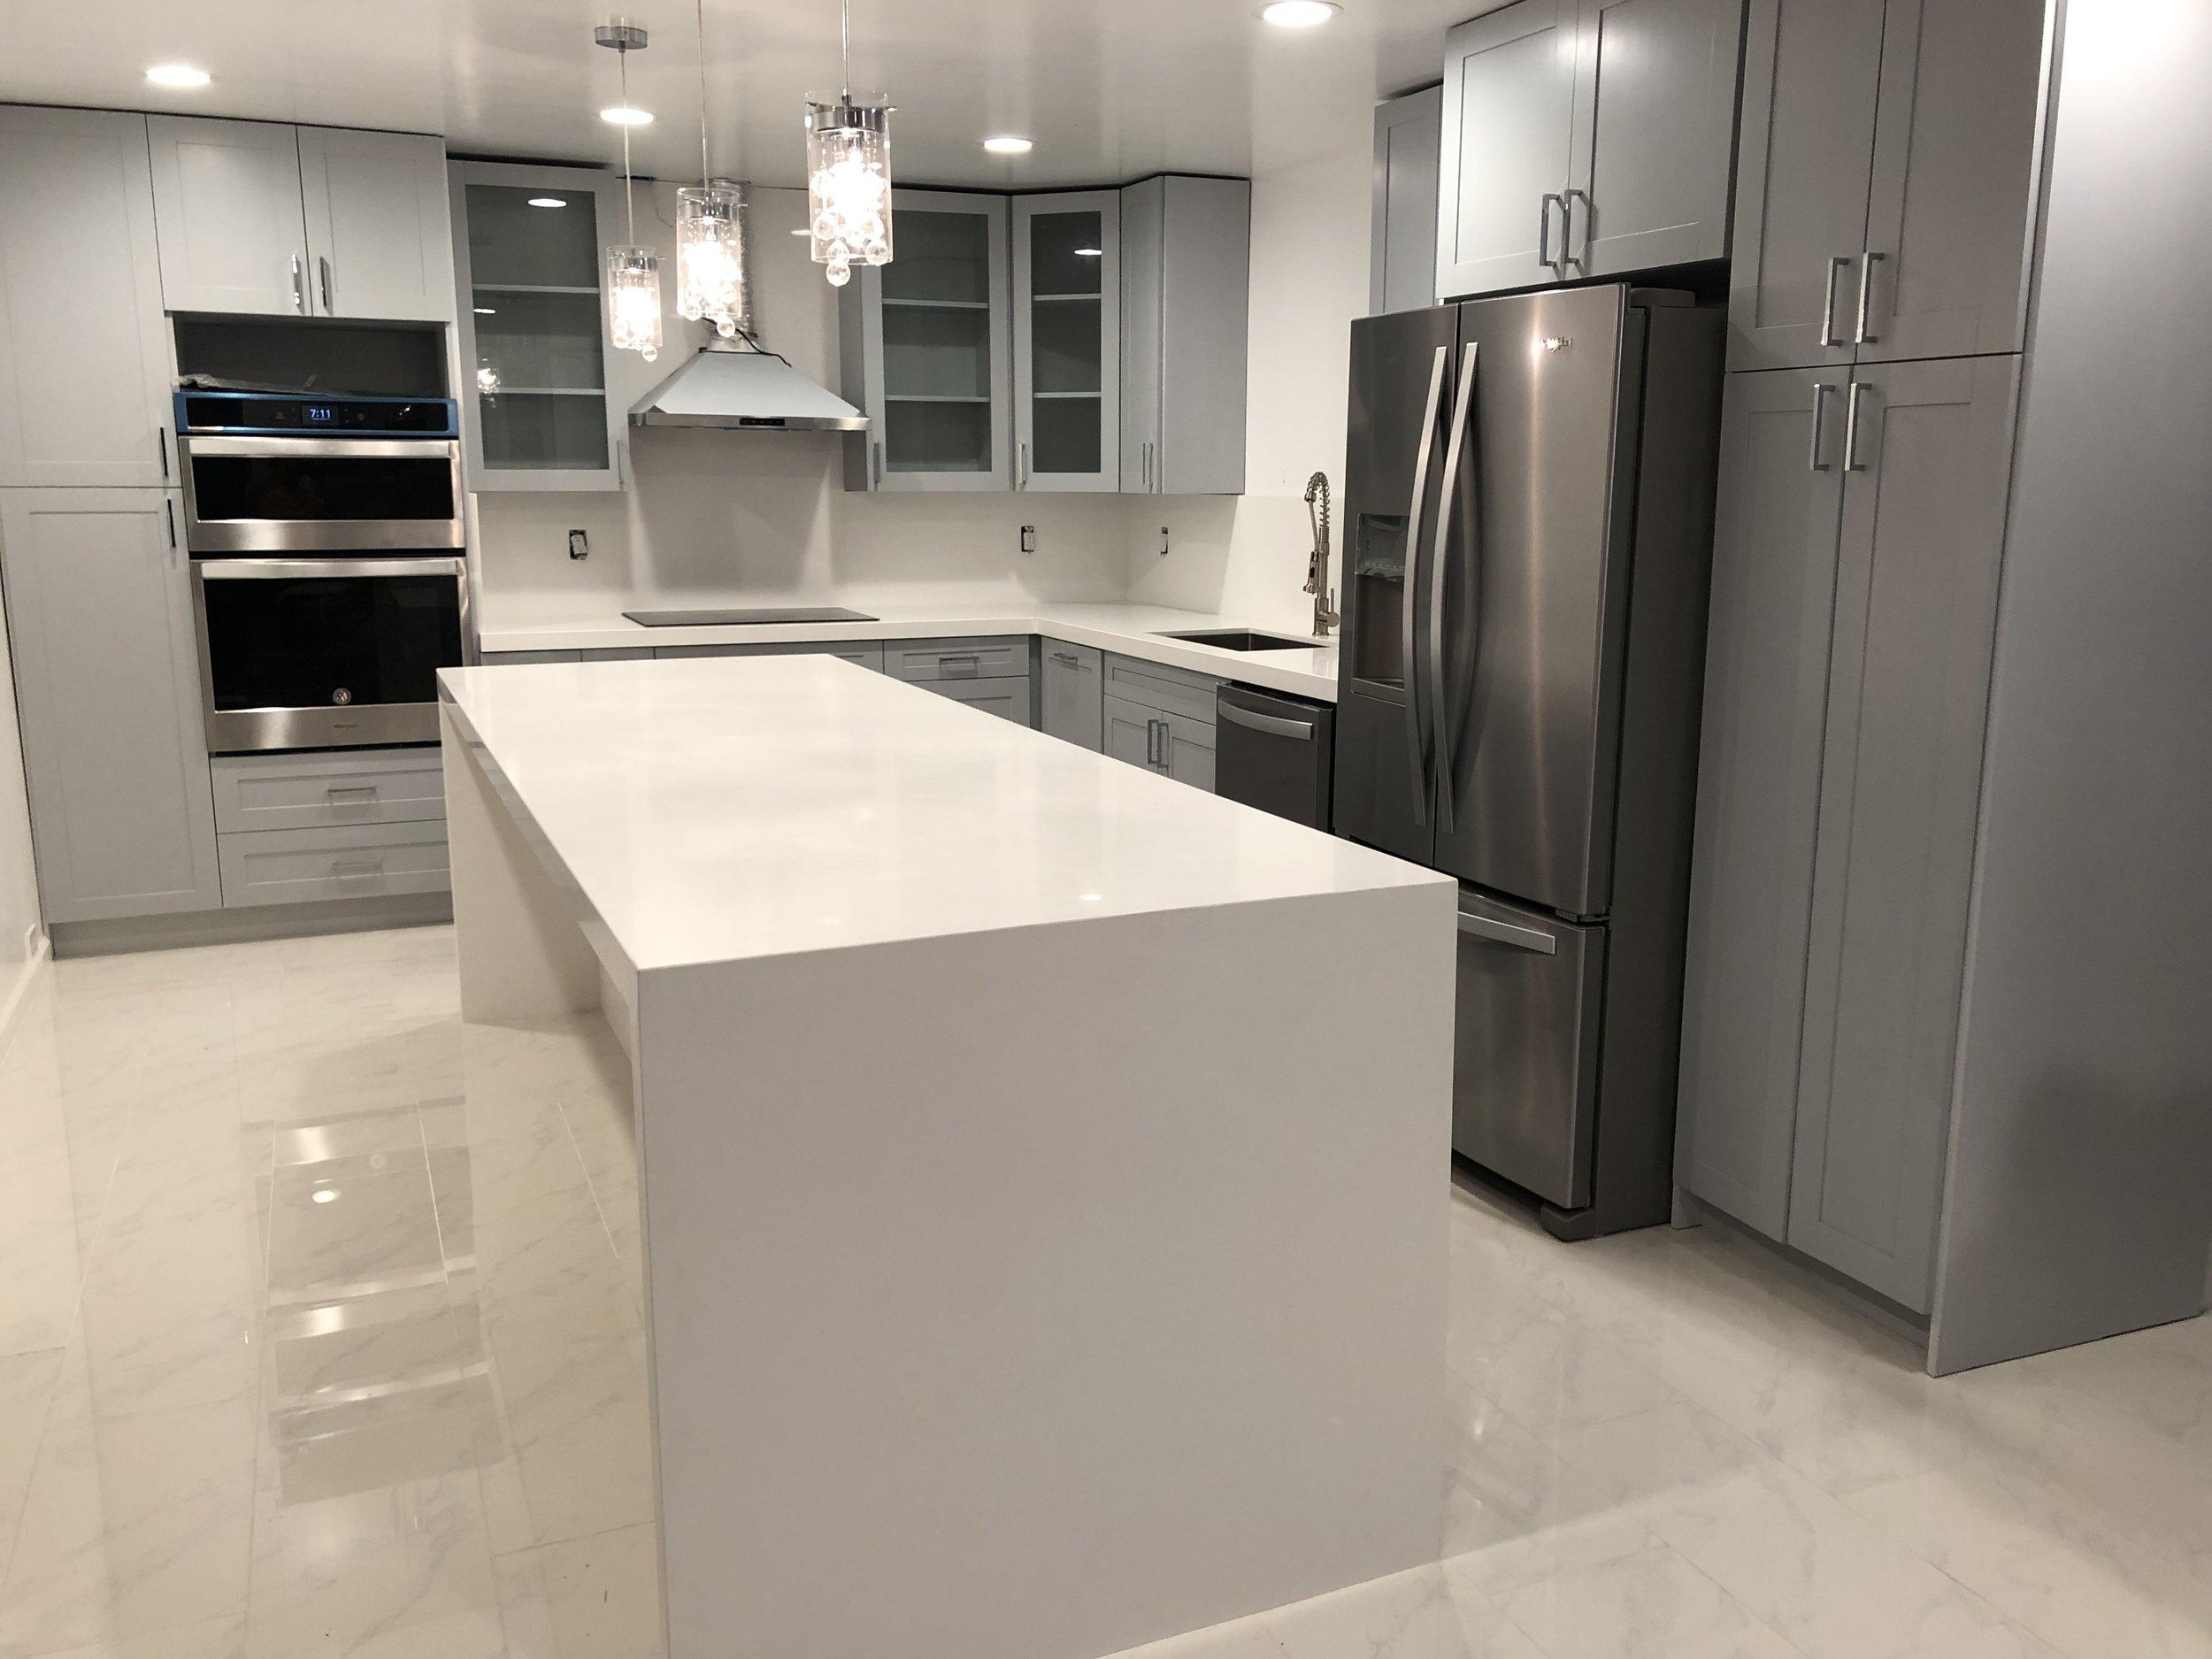 Hawaii Kai Residence - Custom waterfall island and L-shaped kitchen counter tops.